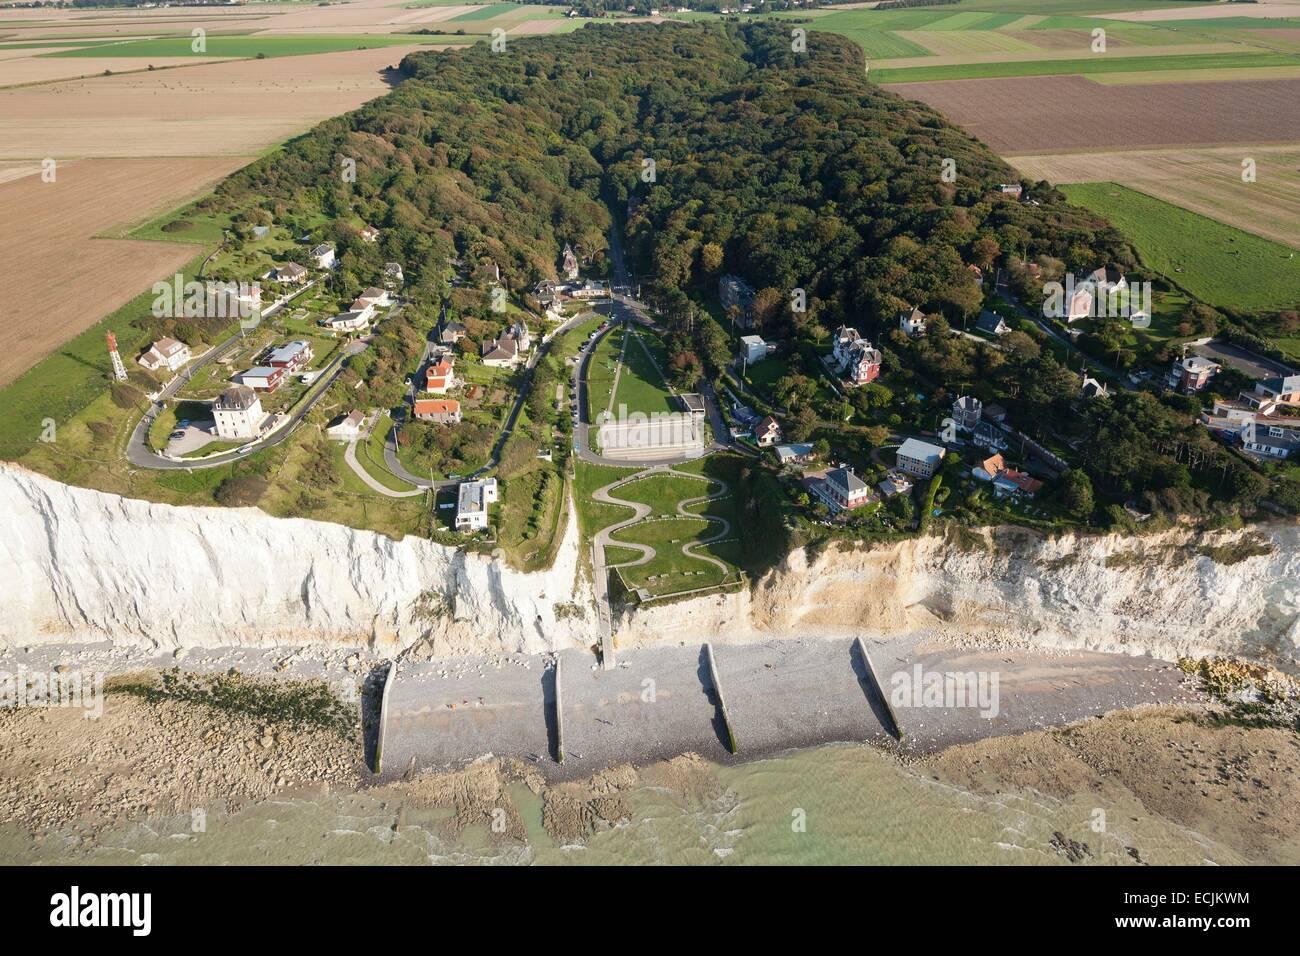 France, Somme, Ault, Bois de Cise (aerial view Stock Photo, Royalty Free Image 76628096 Alamy # Bois De Chauffage Somme Particulier